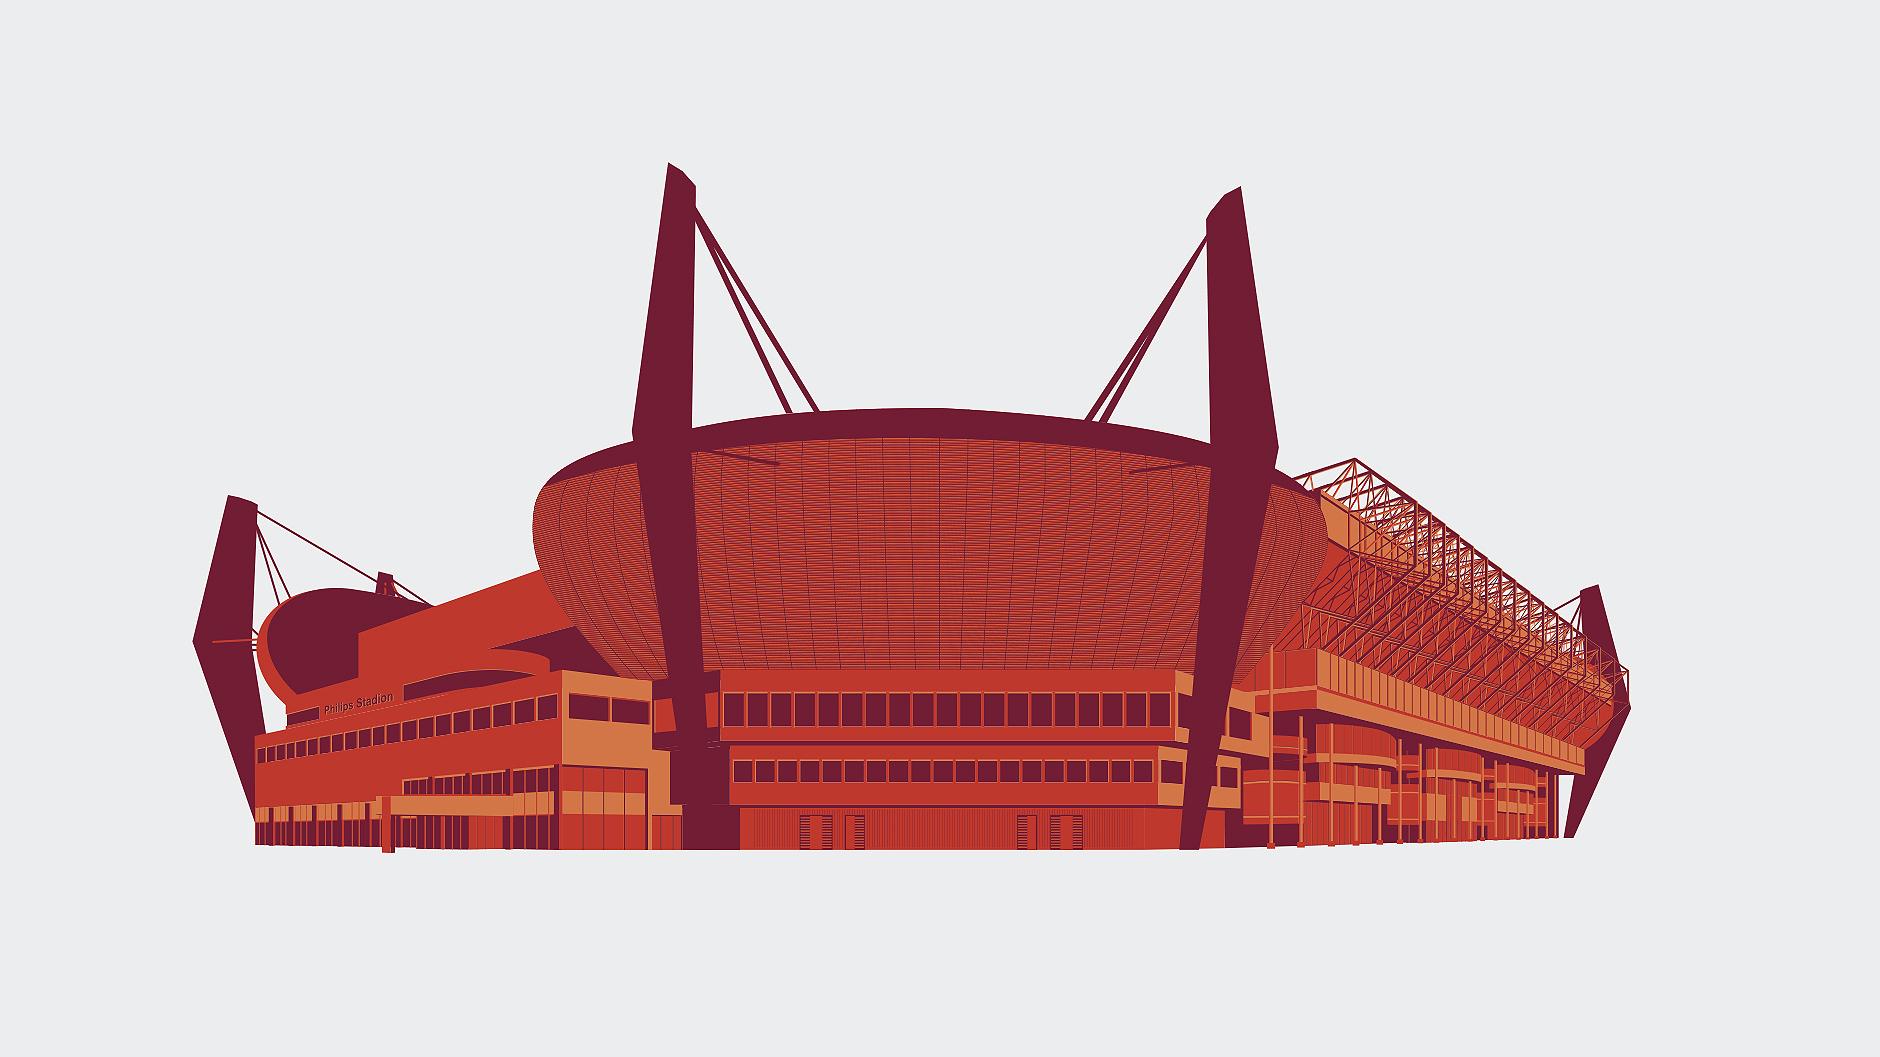 phlips_stadion_ndiepen_eindhoven_retina